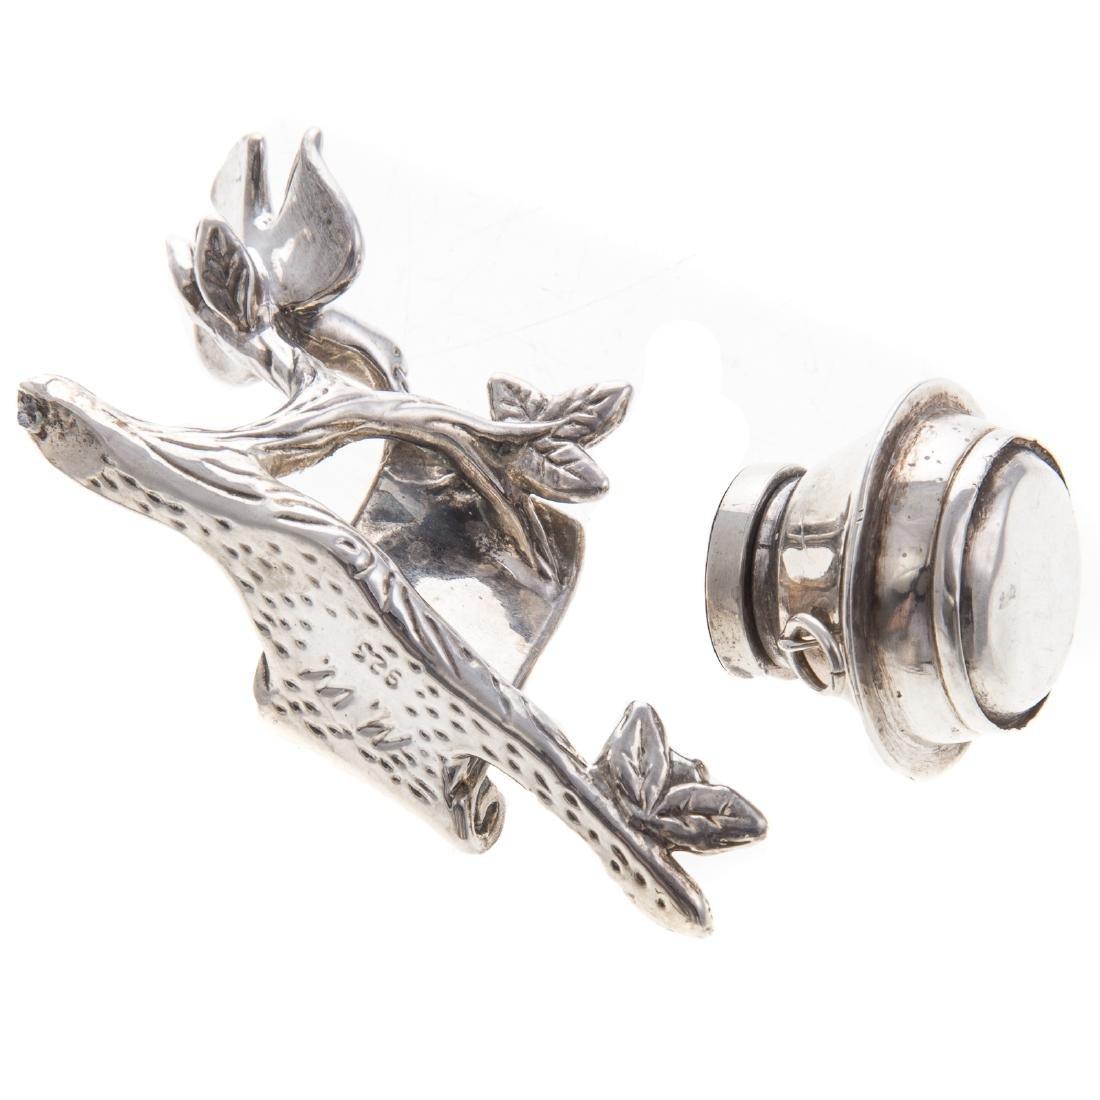 American & Continental silver objets de vertu - 5